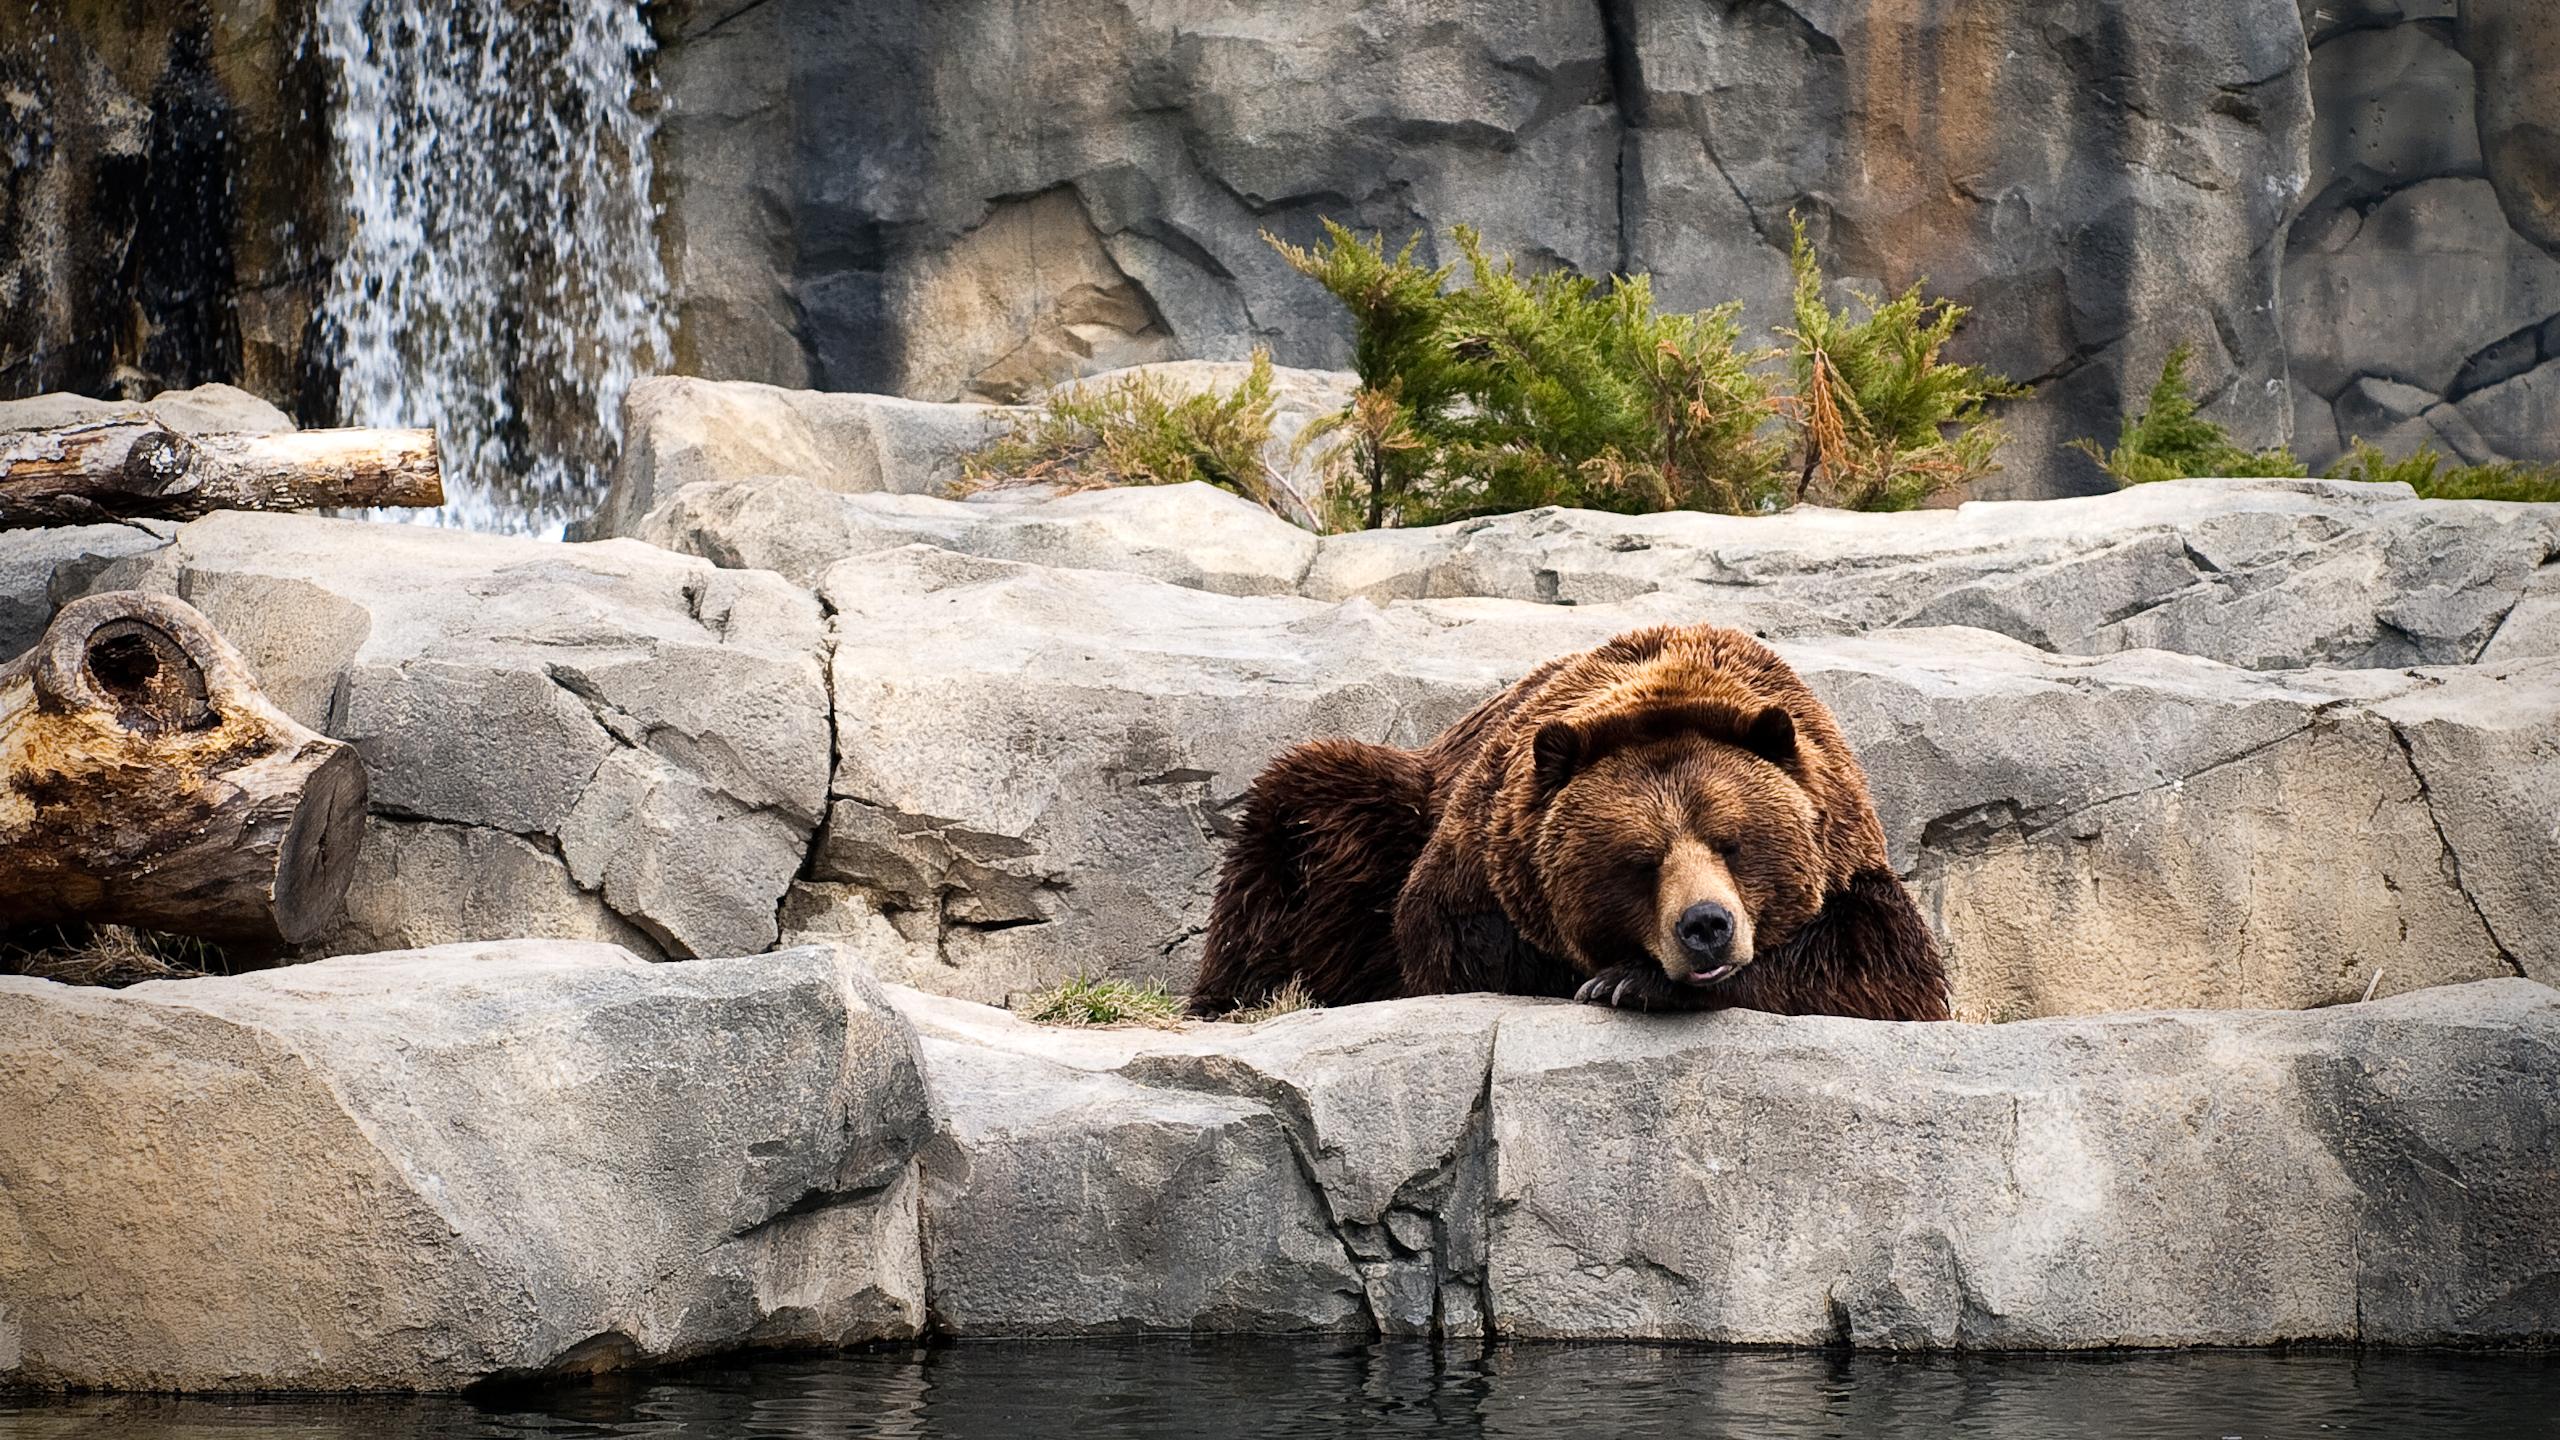 bears_life_wallpaper_2560x1440